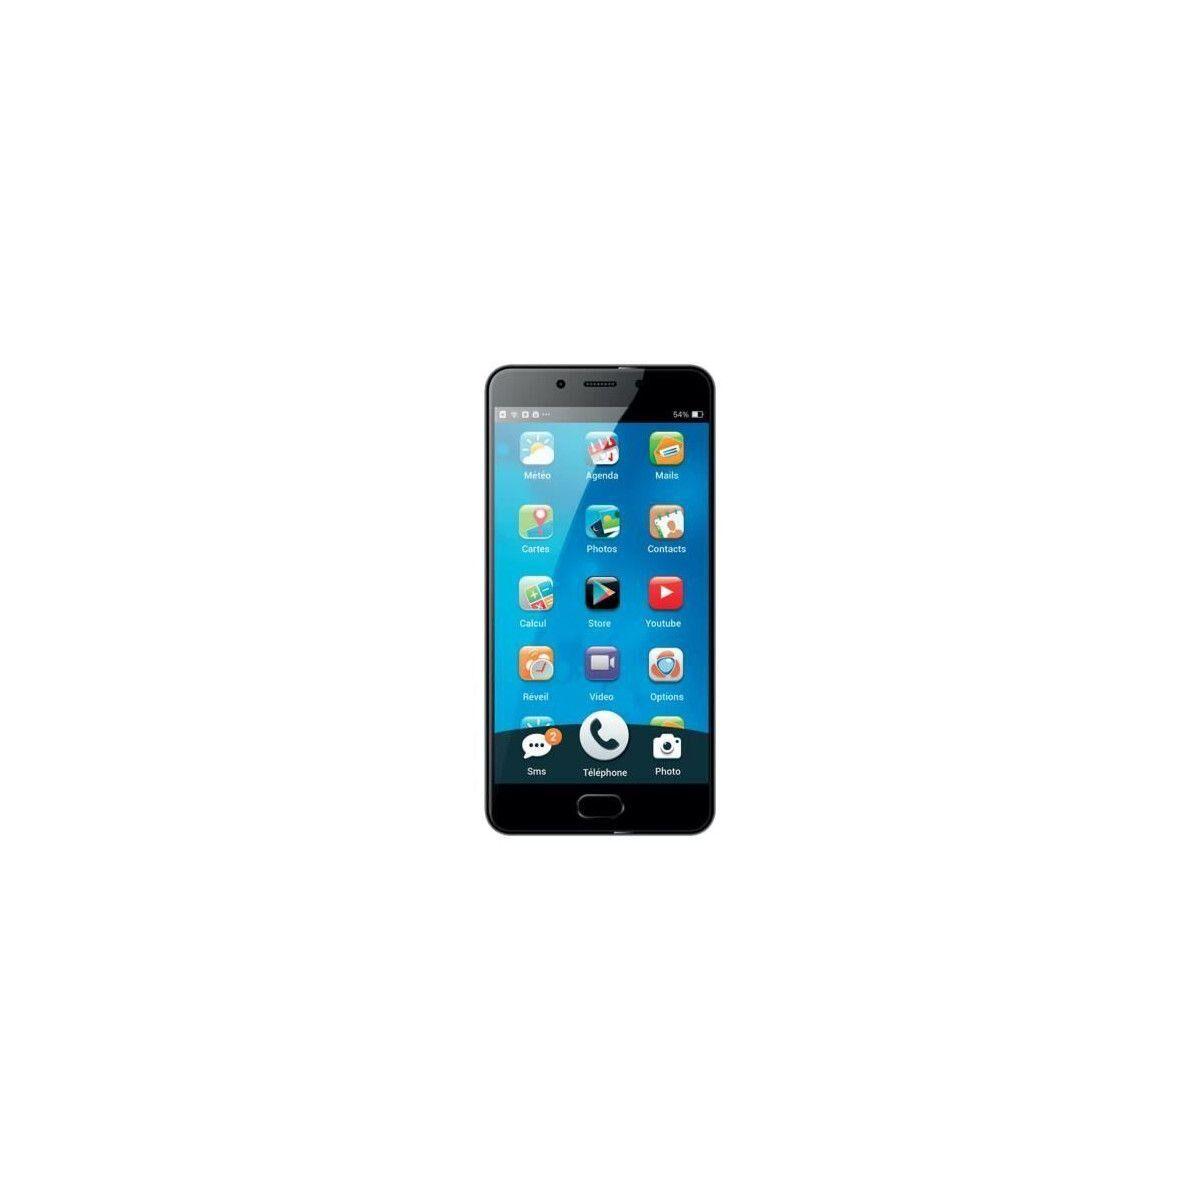 ORDISSIMO Smartphone LeNumero1 - 4G LTE - Android 6.0 adapte - Grand ecran 5.5 - Acces simplifie aux principales fonctions